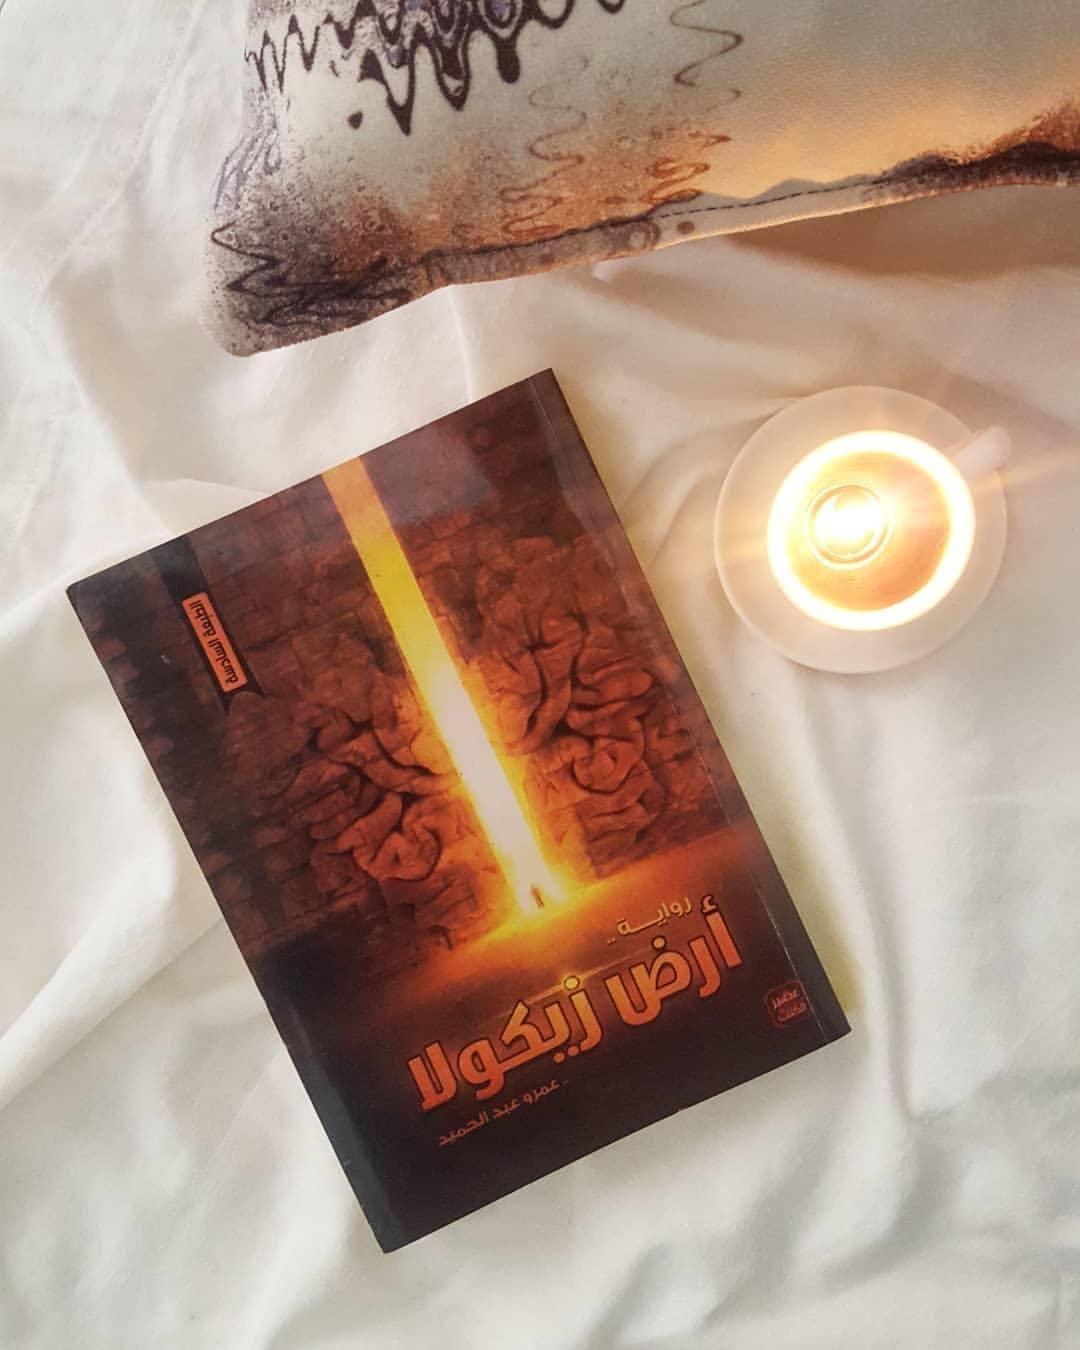 رواية ارض زيكولا Book Cover Books App